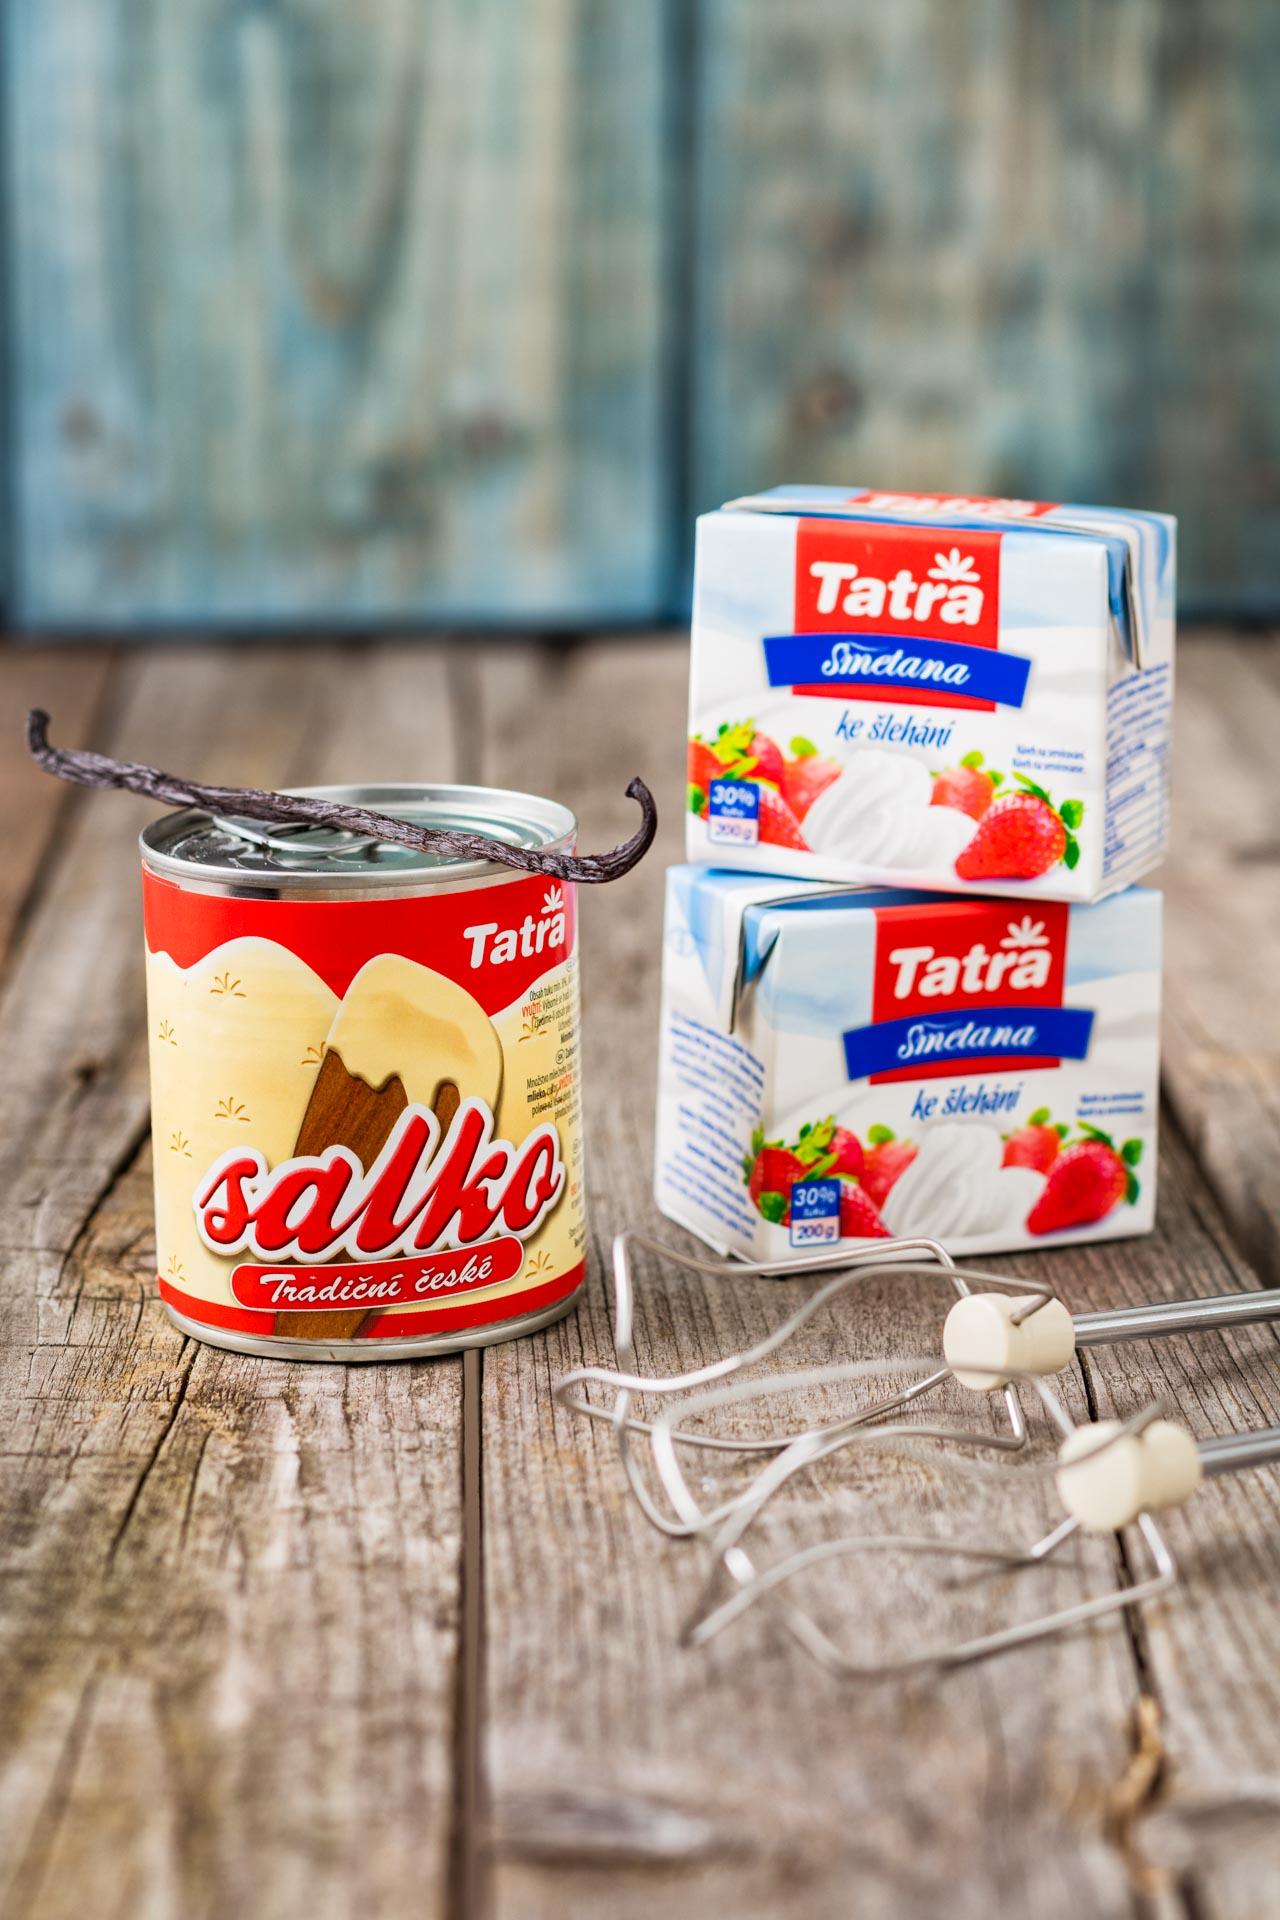 Ingredients for Vanilla ice recipe, tatra salko and cream